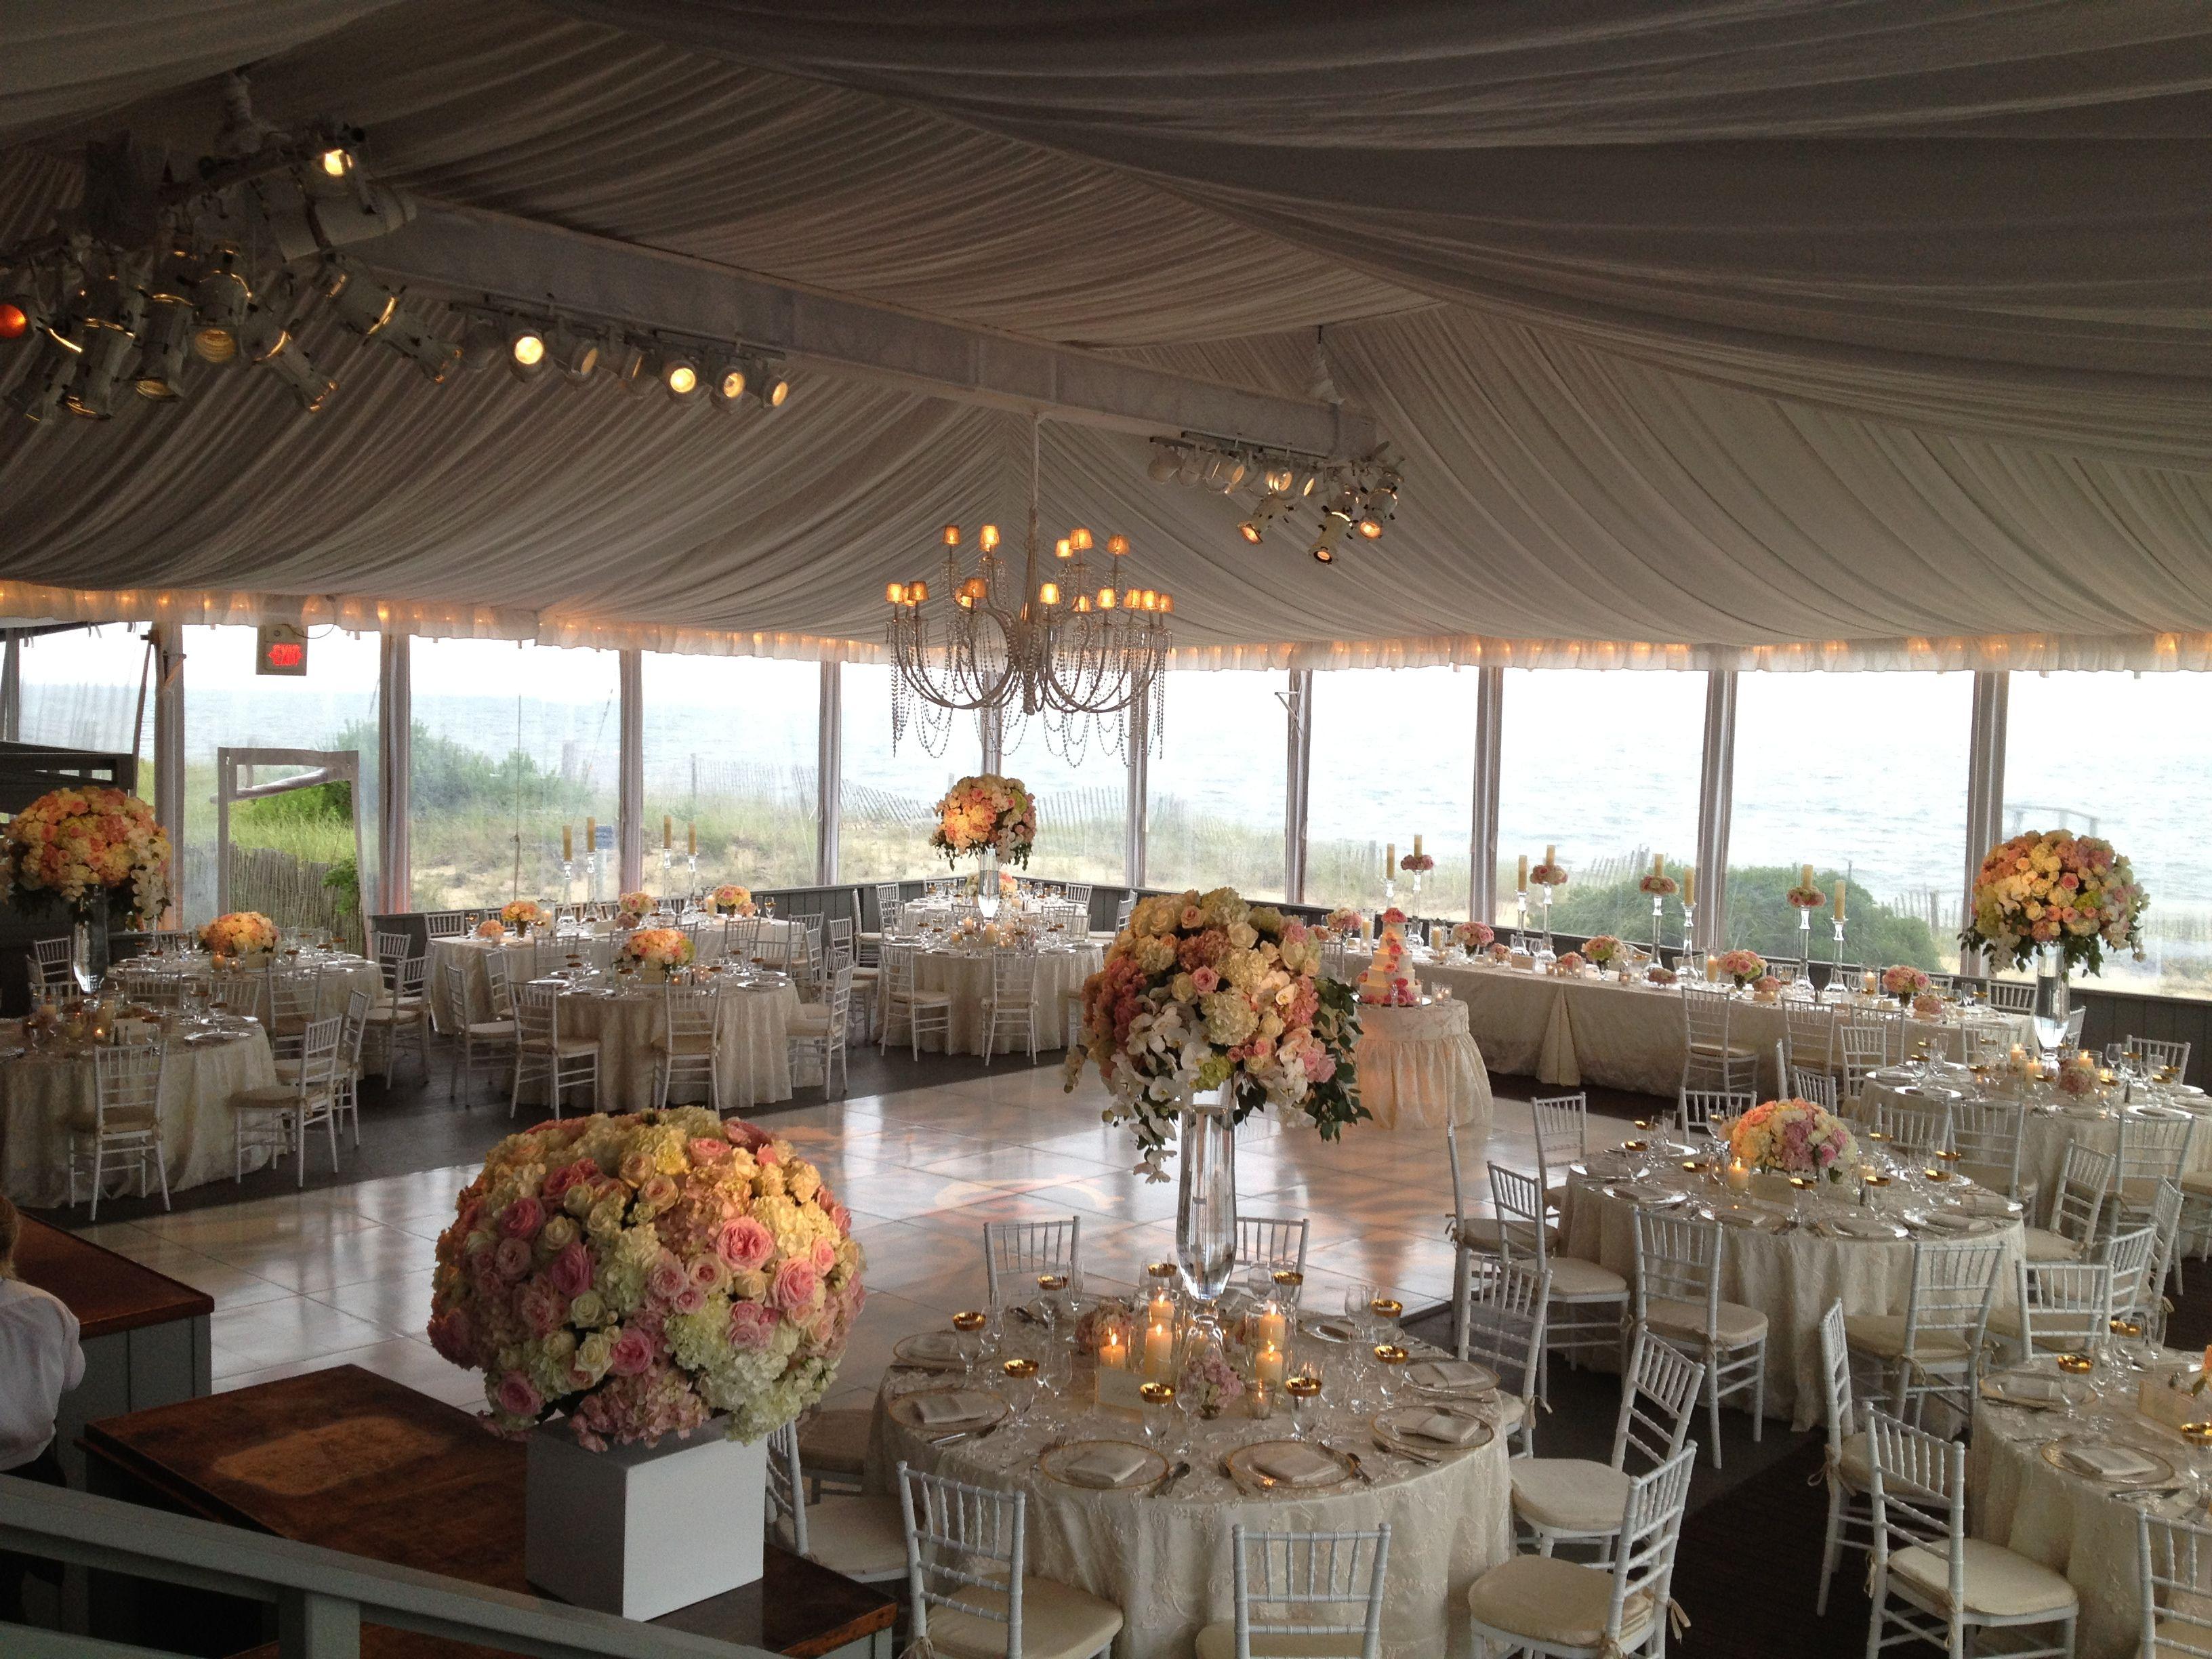 Attractive Cape Cod Wedding Ideas Part - 14: Beautiful Wedding At The Popponesset Inn In Mashpee, MA (Cape Cod) Www.